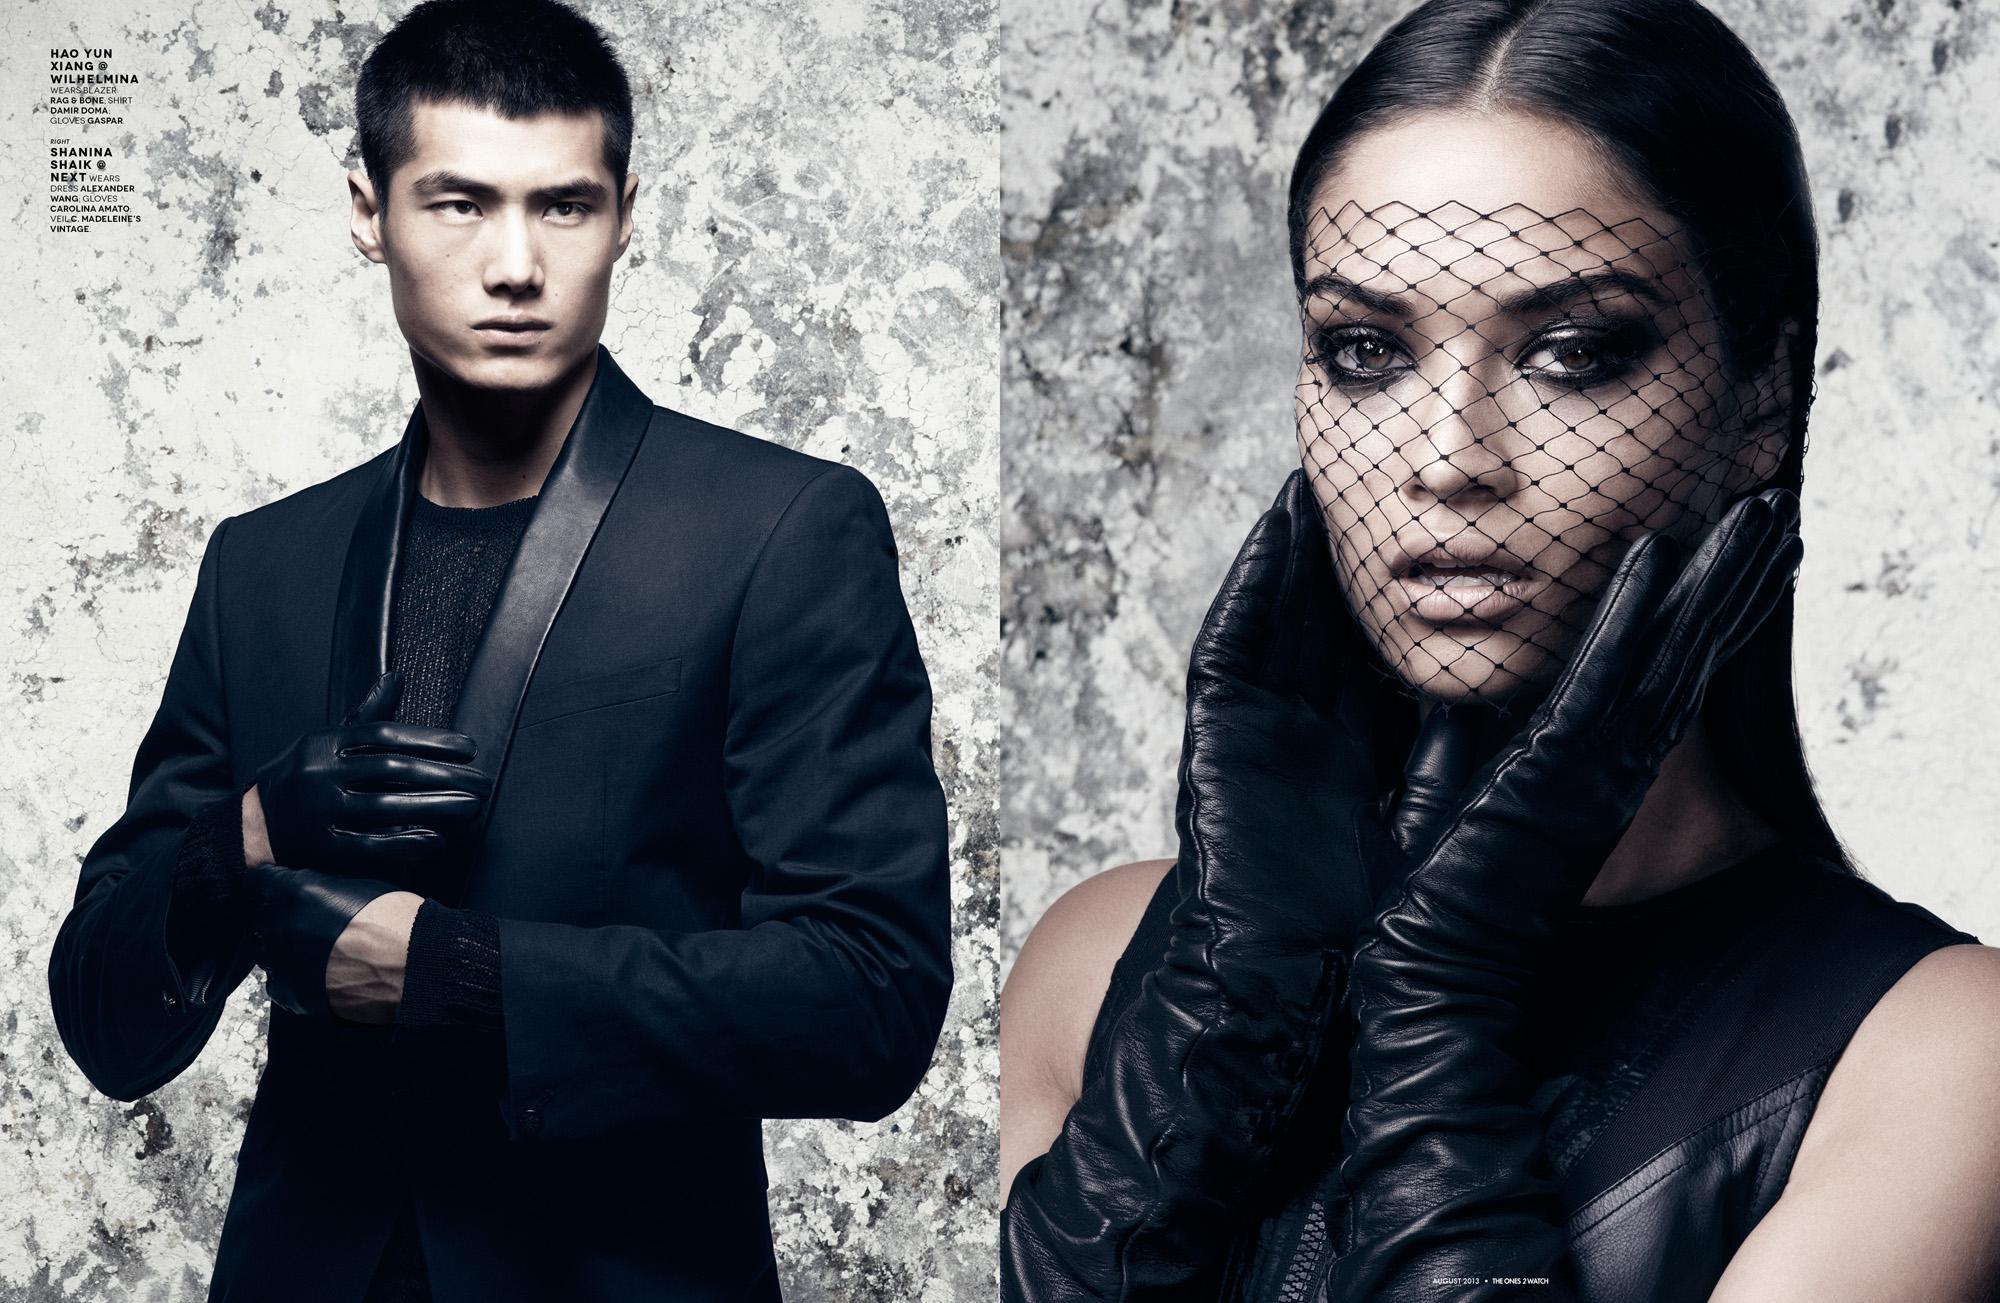 Hao Yun Xiang @ Wilhelmina wears blazer Rag & Bone; shirt Damir Doma; gloves Gaspar.  Right: Shanina Shaik @ Next wears dress Alexander Wang; gloves Carolina Amato; veil C. Madeleine's Vintage.